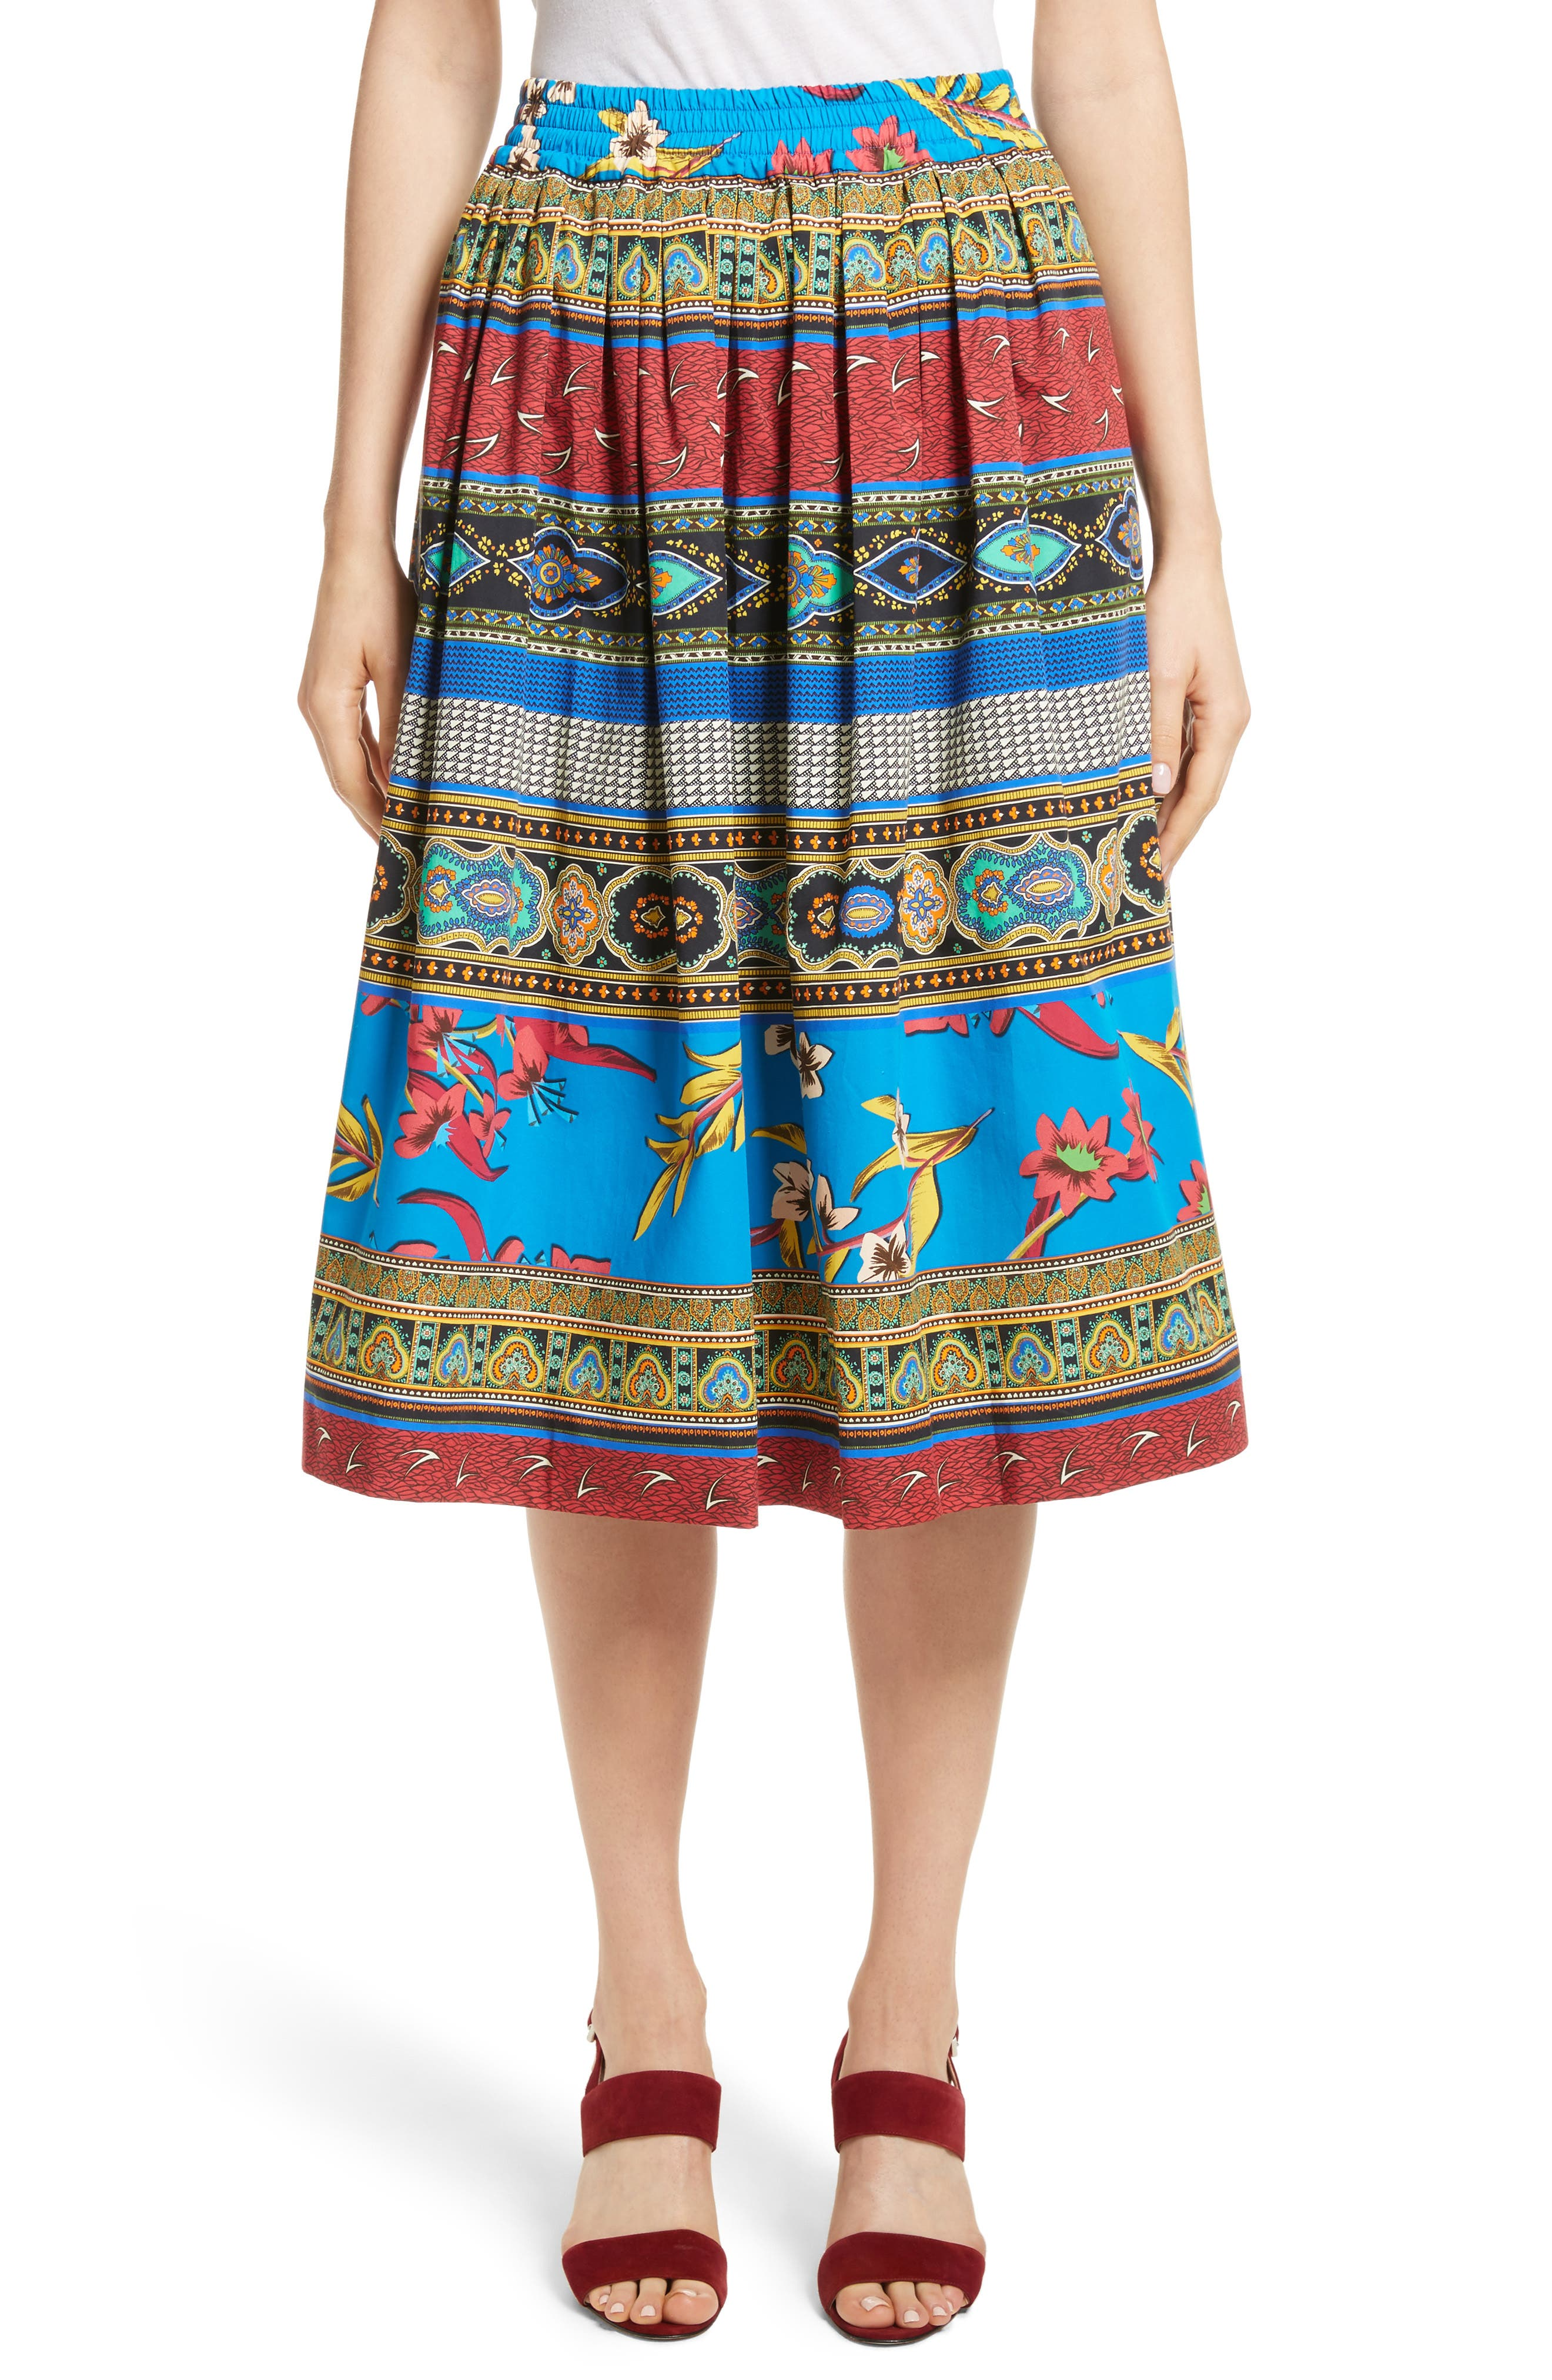 Alternate Image 1 Selected - Etro Floral Geo Print Cotton Skirt